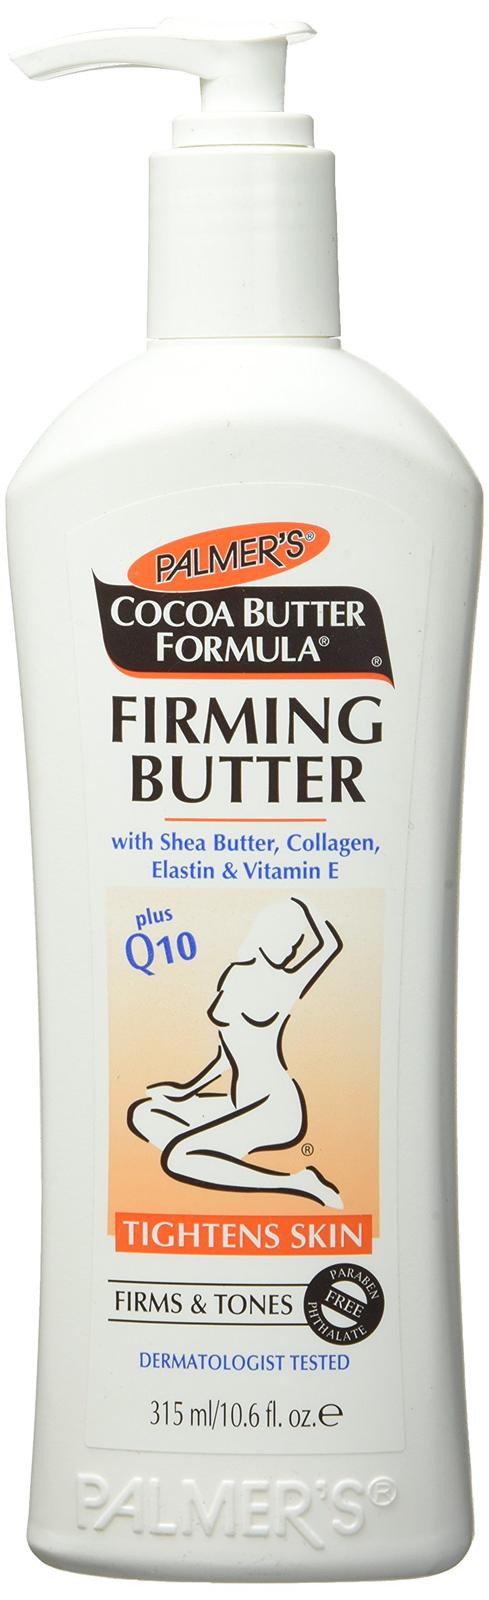 Palmers Cocoa Butter Firming Butter 10.6oz Pump